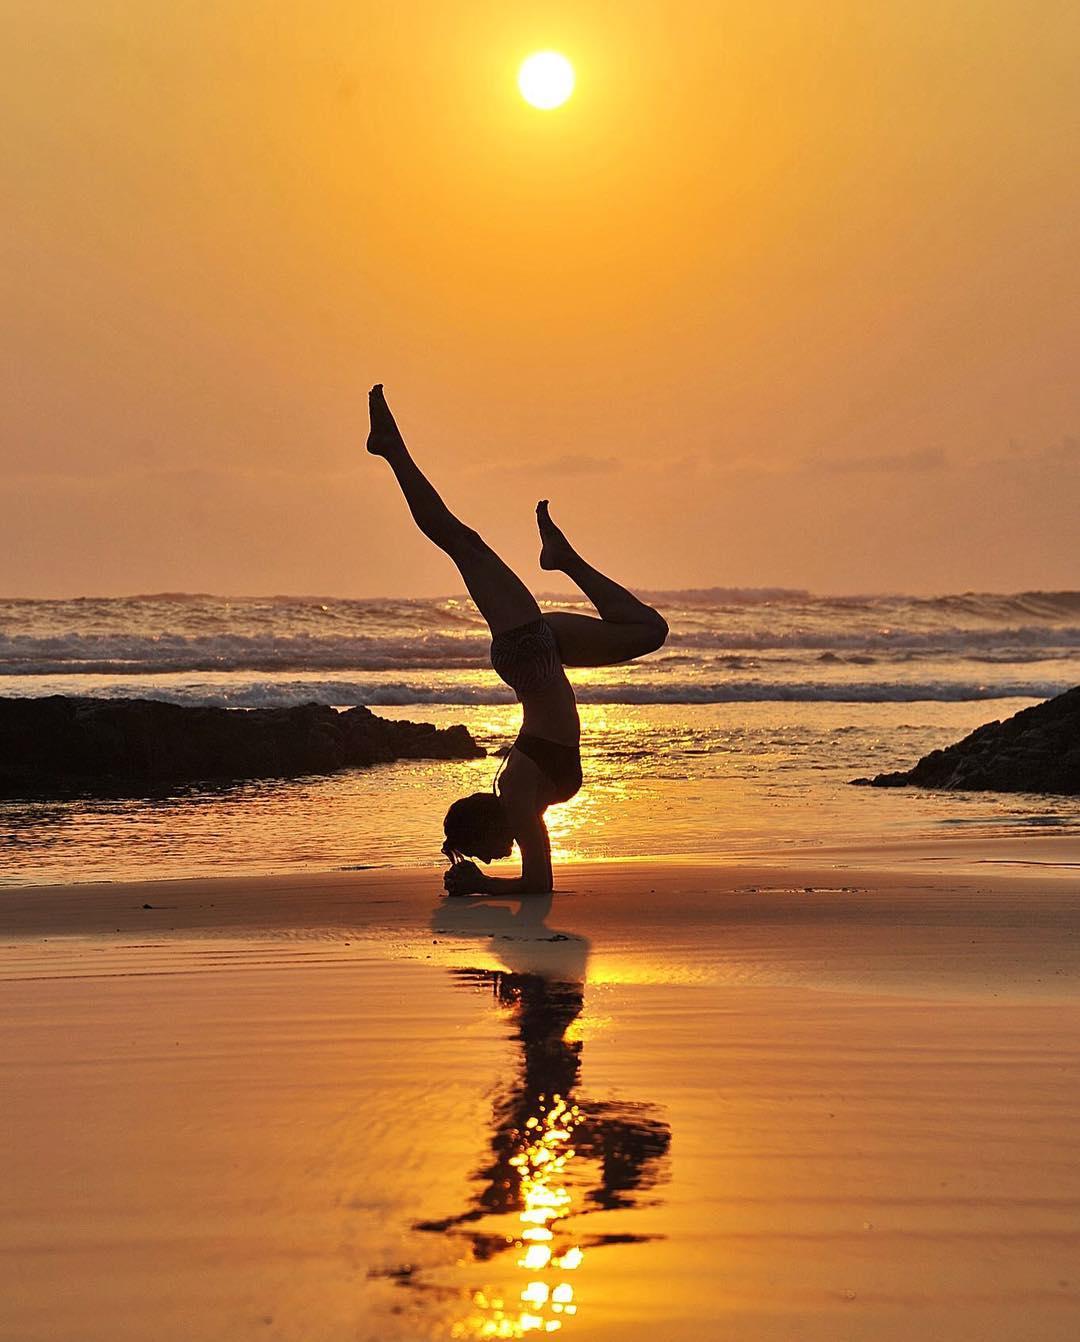 Yoga and sunsets at Santa Teresa beach, photo credit @nancygoodfellowyoga.